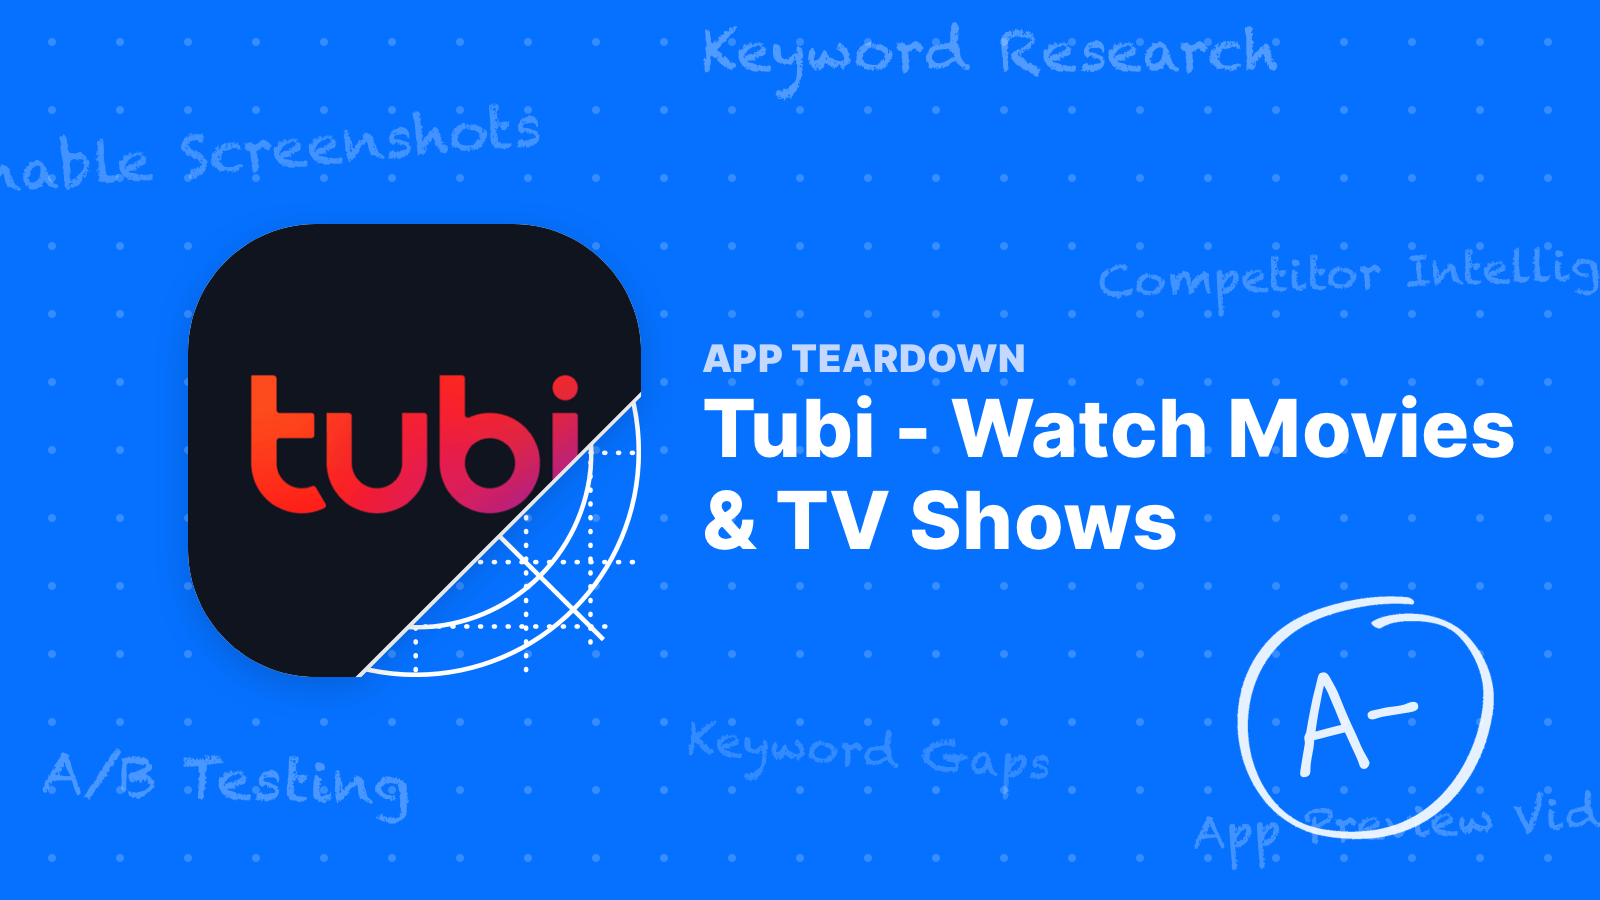 ASO Teardown - Tubi Owns Movies, but Can It Take on Netflix?